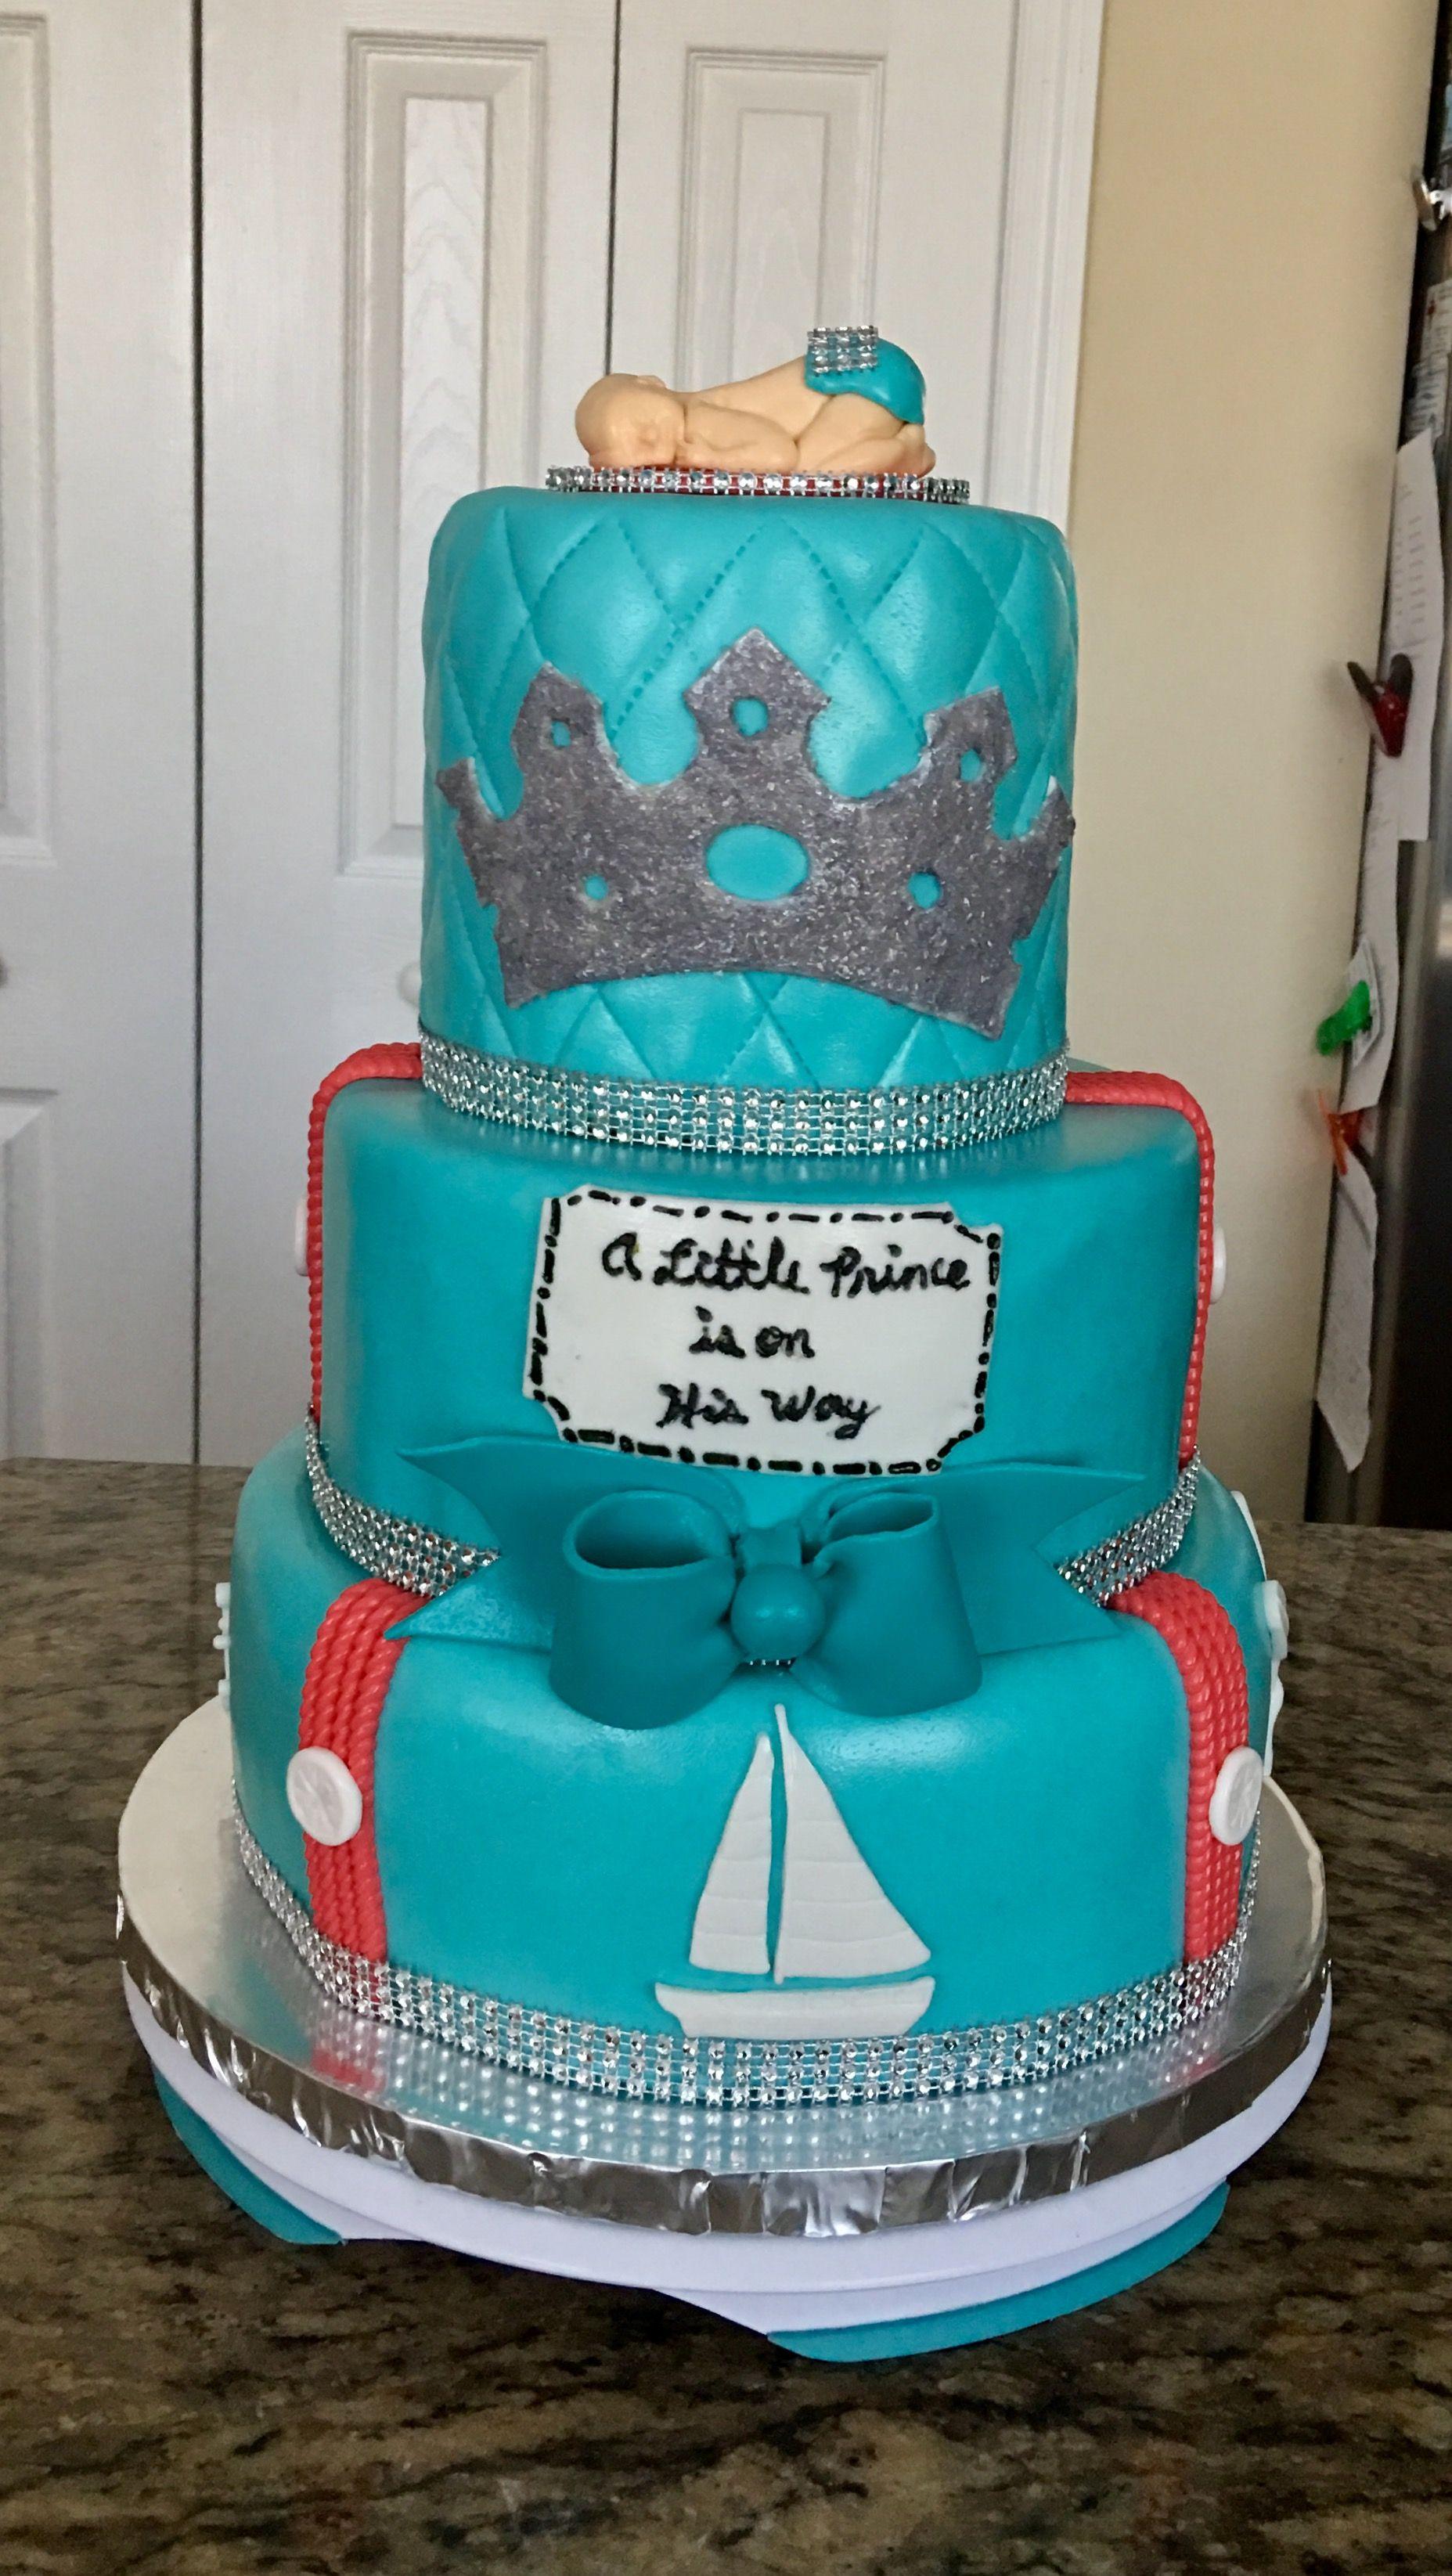 Pin by carol liston on baking cupcake cakes sans rival